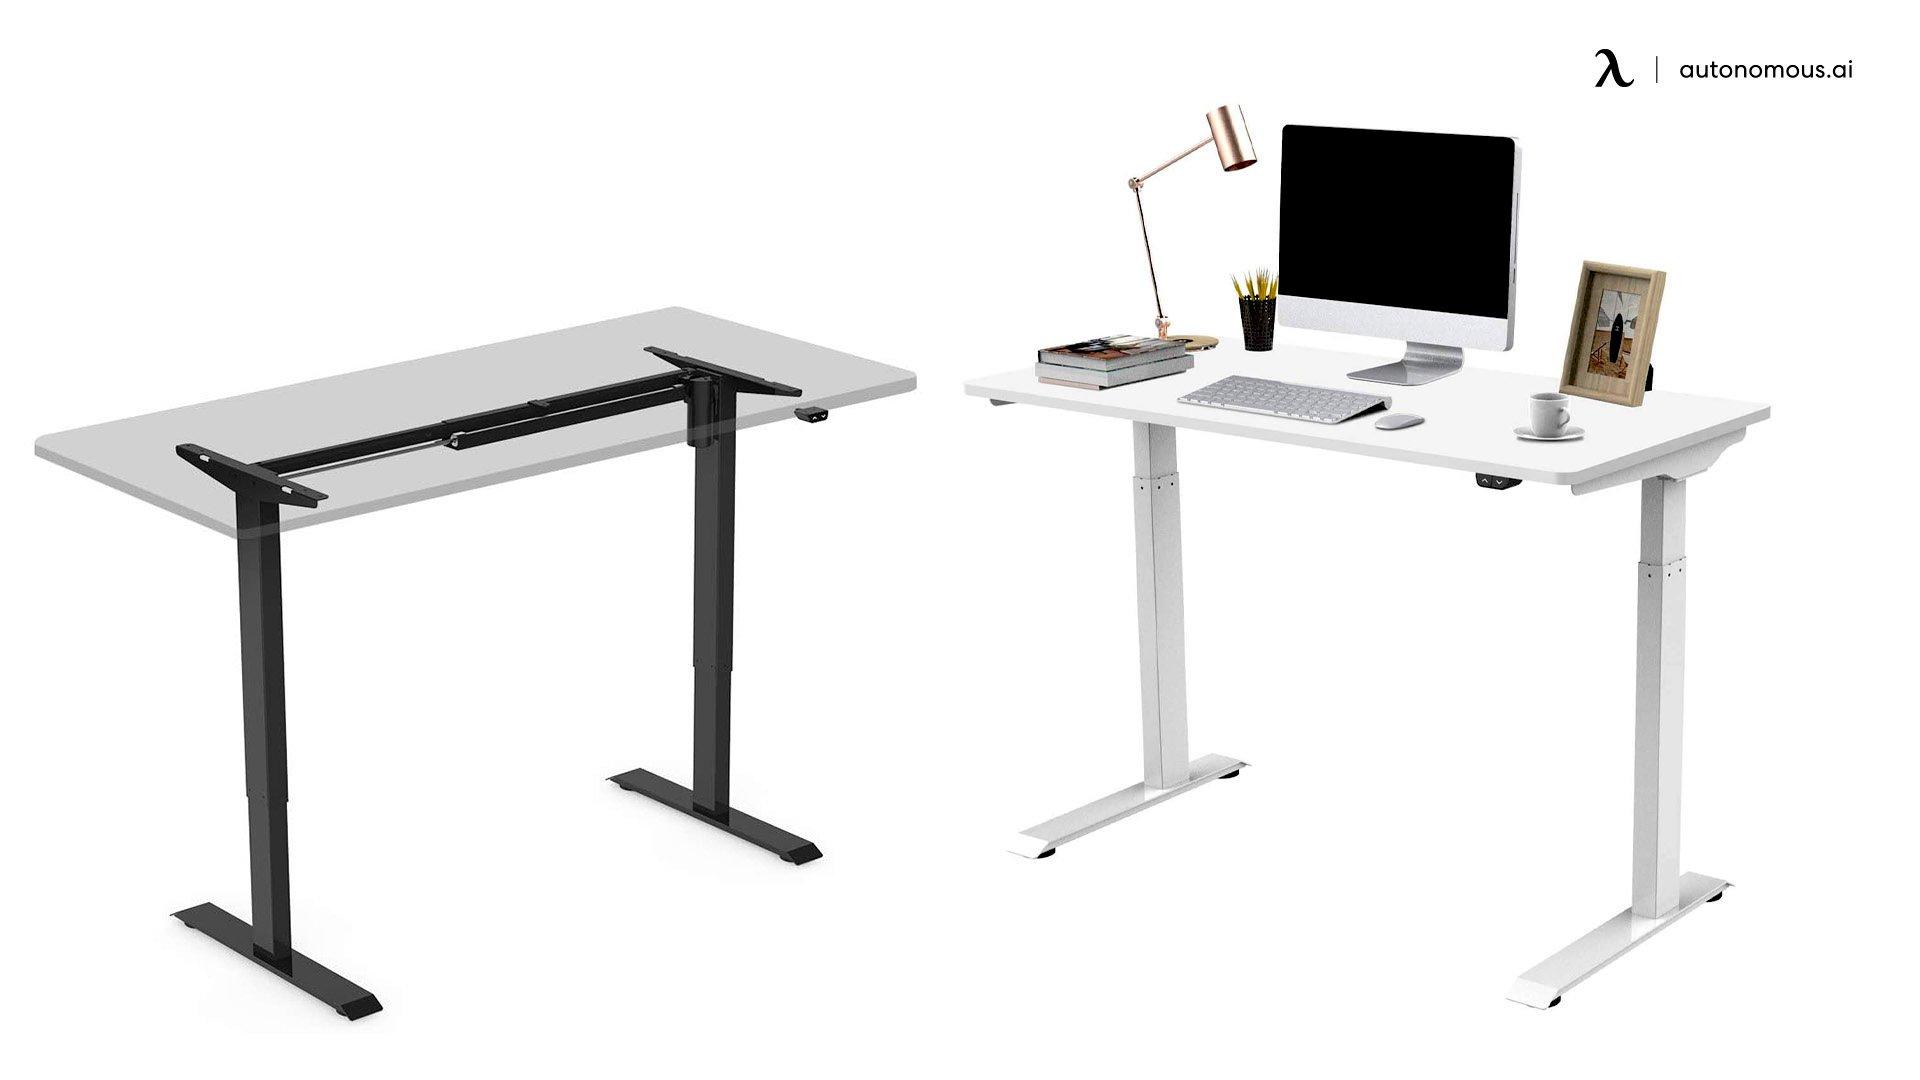 FlexiSpot Desk Frames